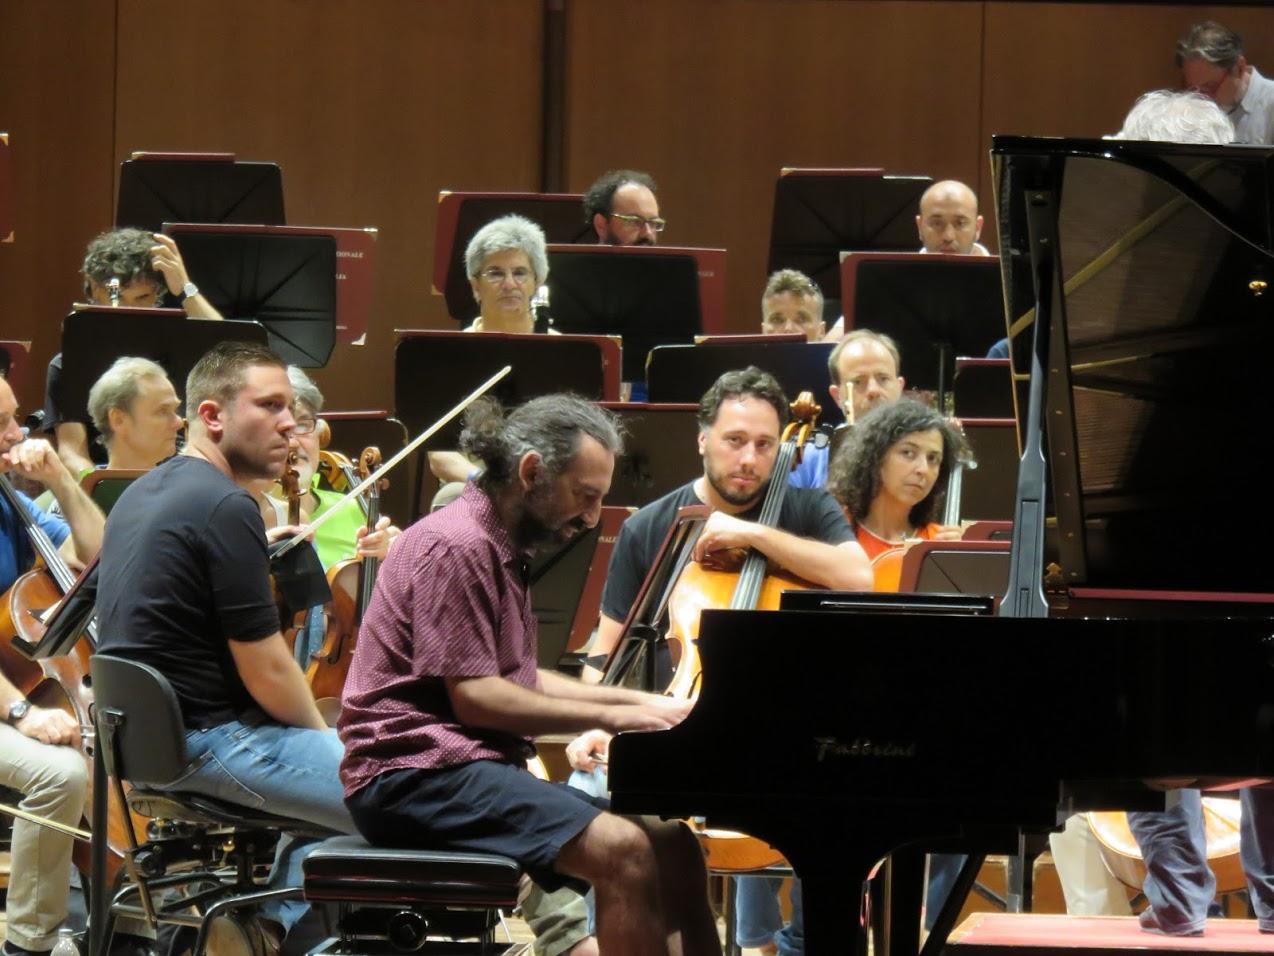 Music Academy of Santa Cecilia Orchestra open rehearsal, photo by Marianna Zsoldos